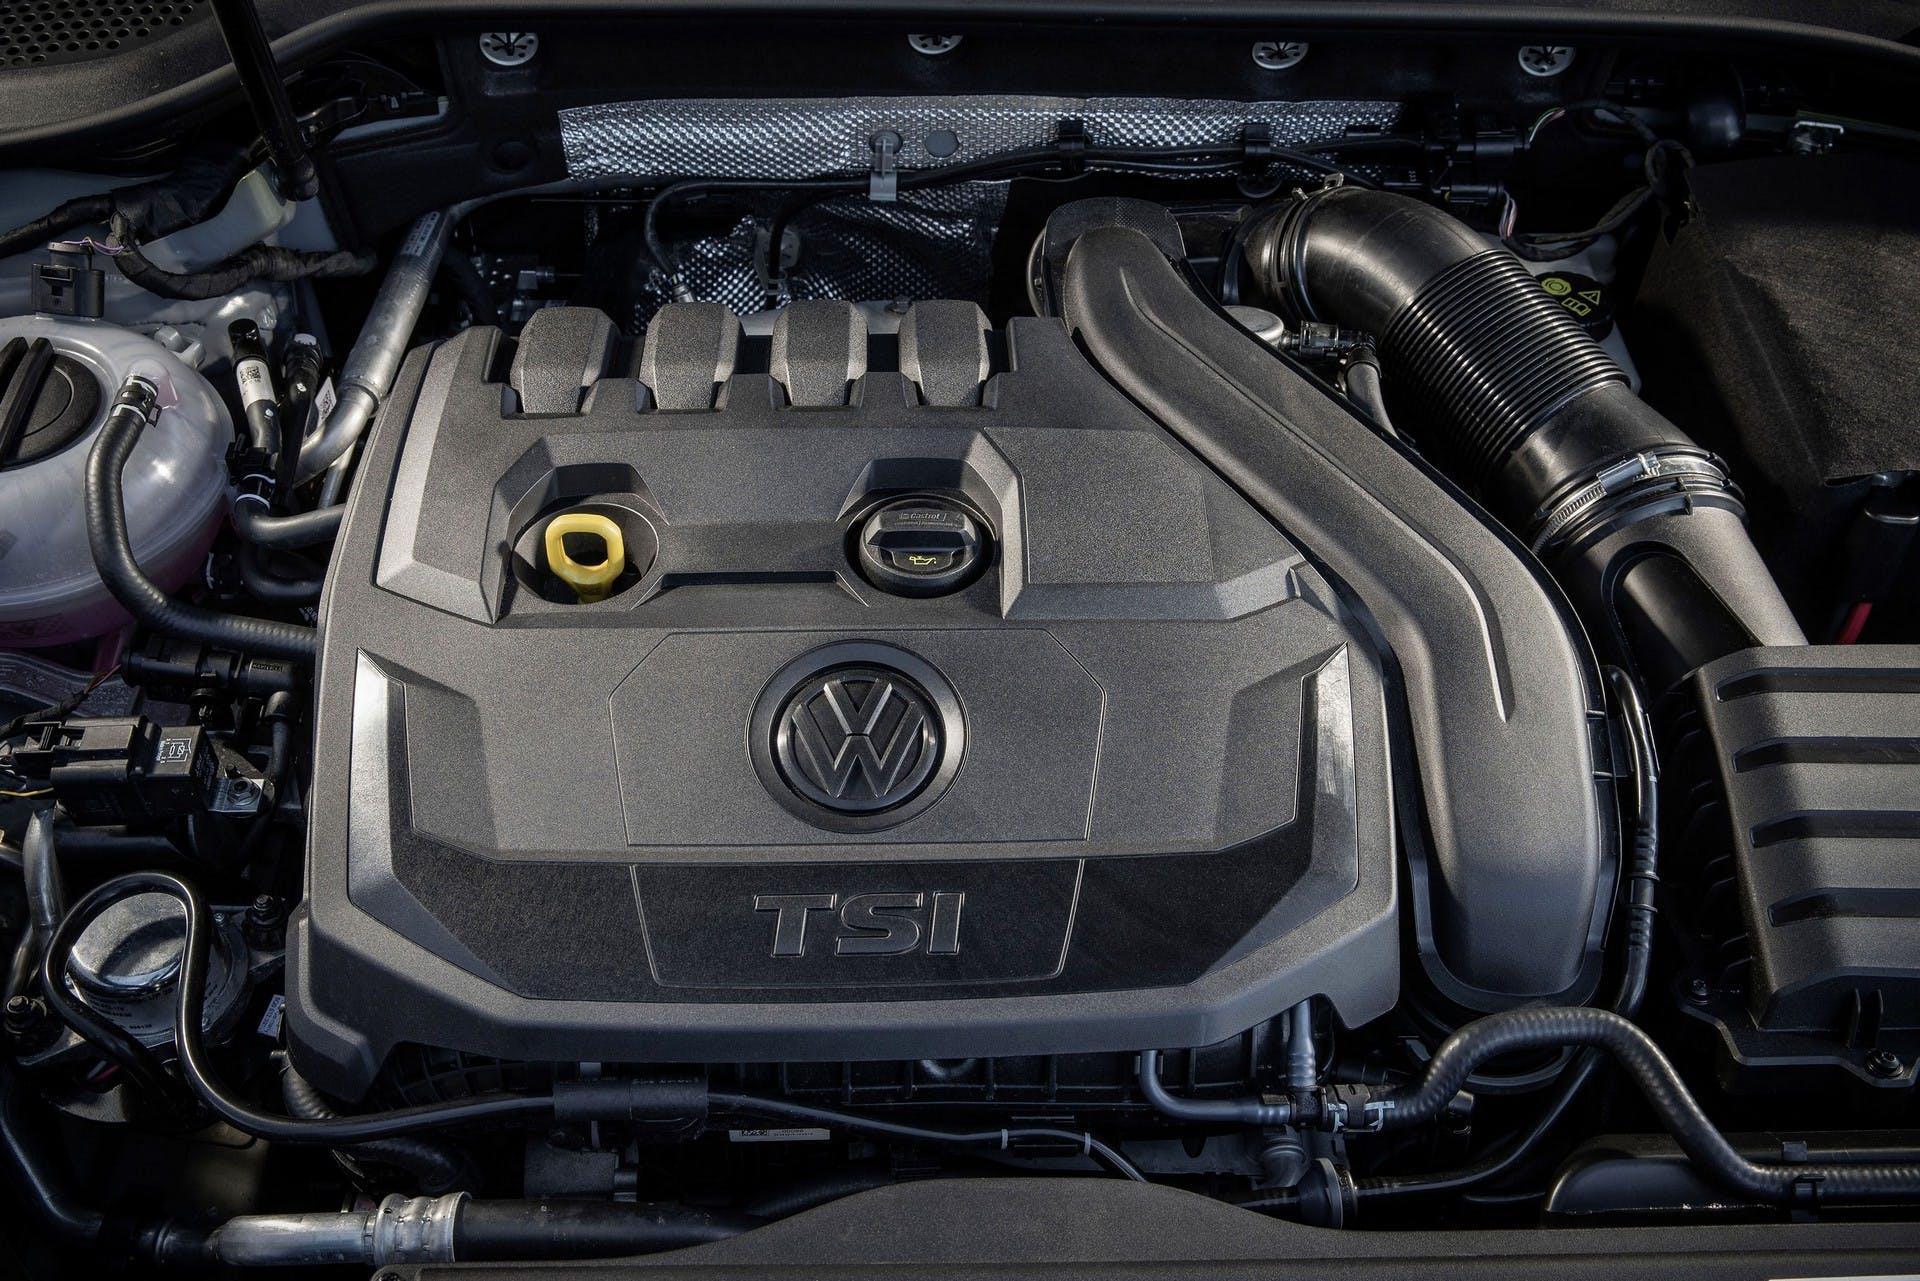 Volkswagen Golf 1.5 TSI motore